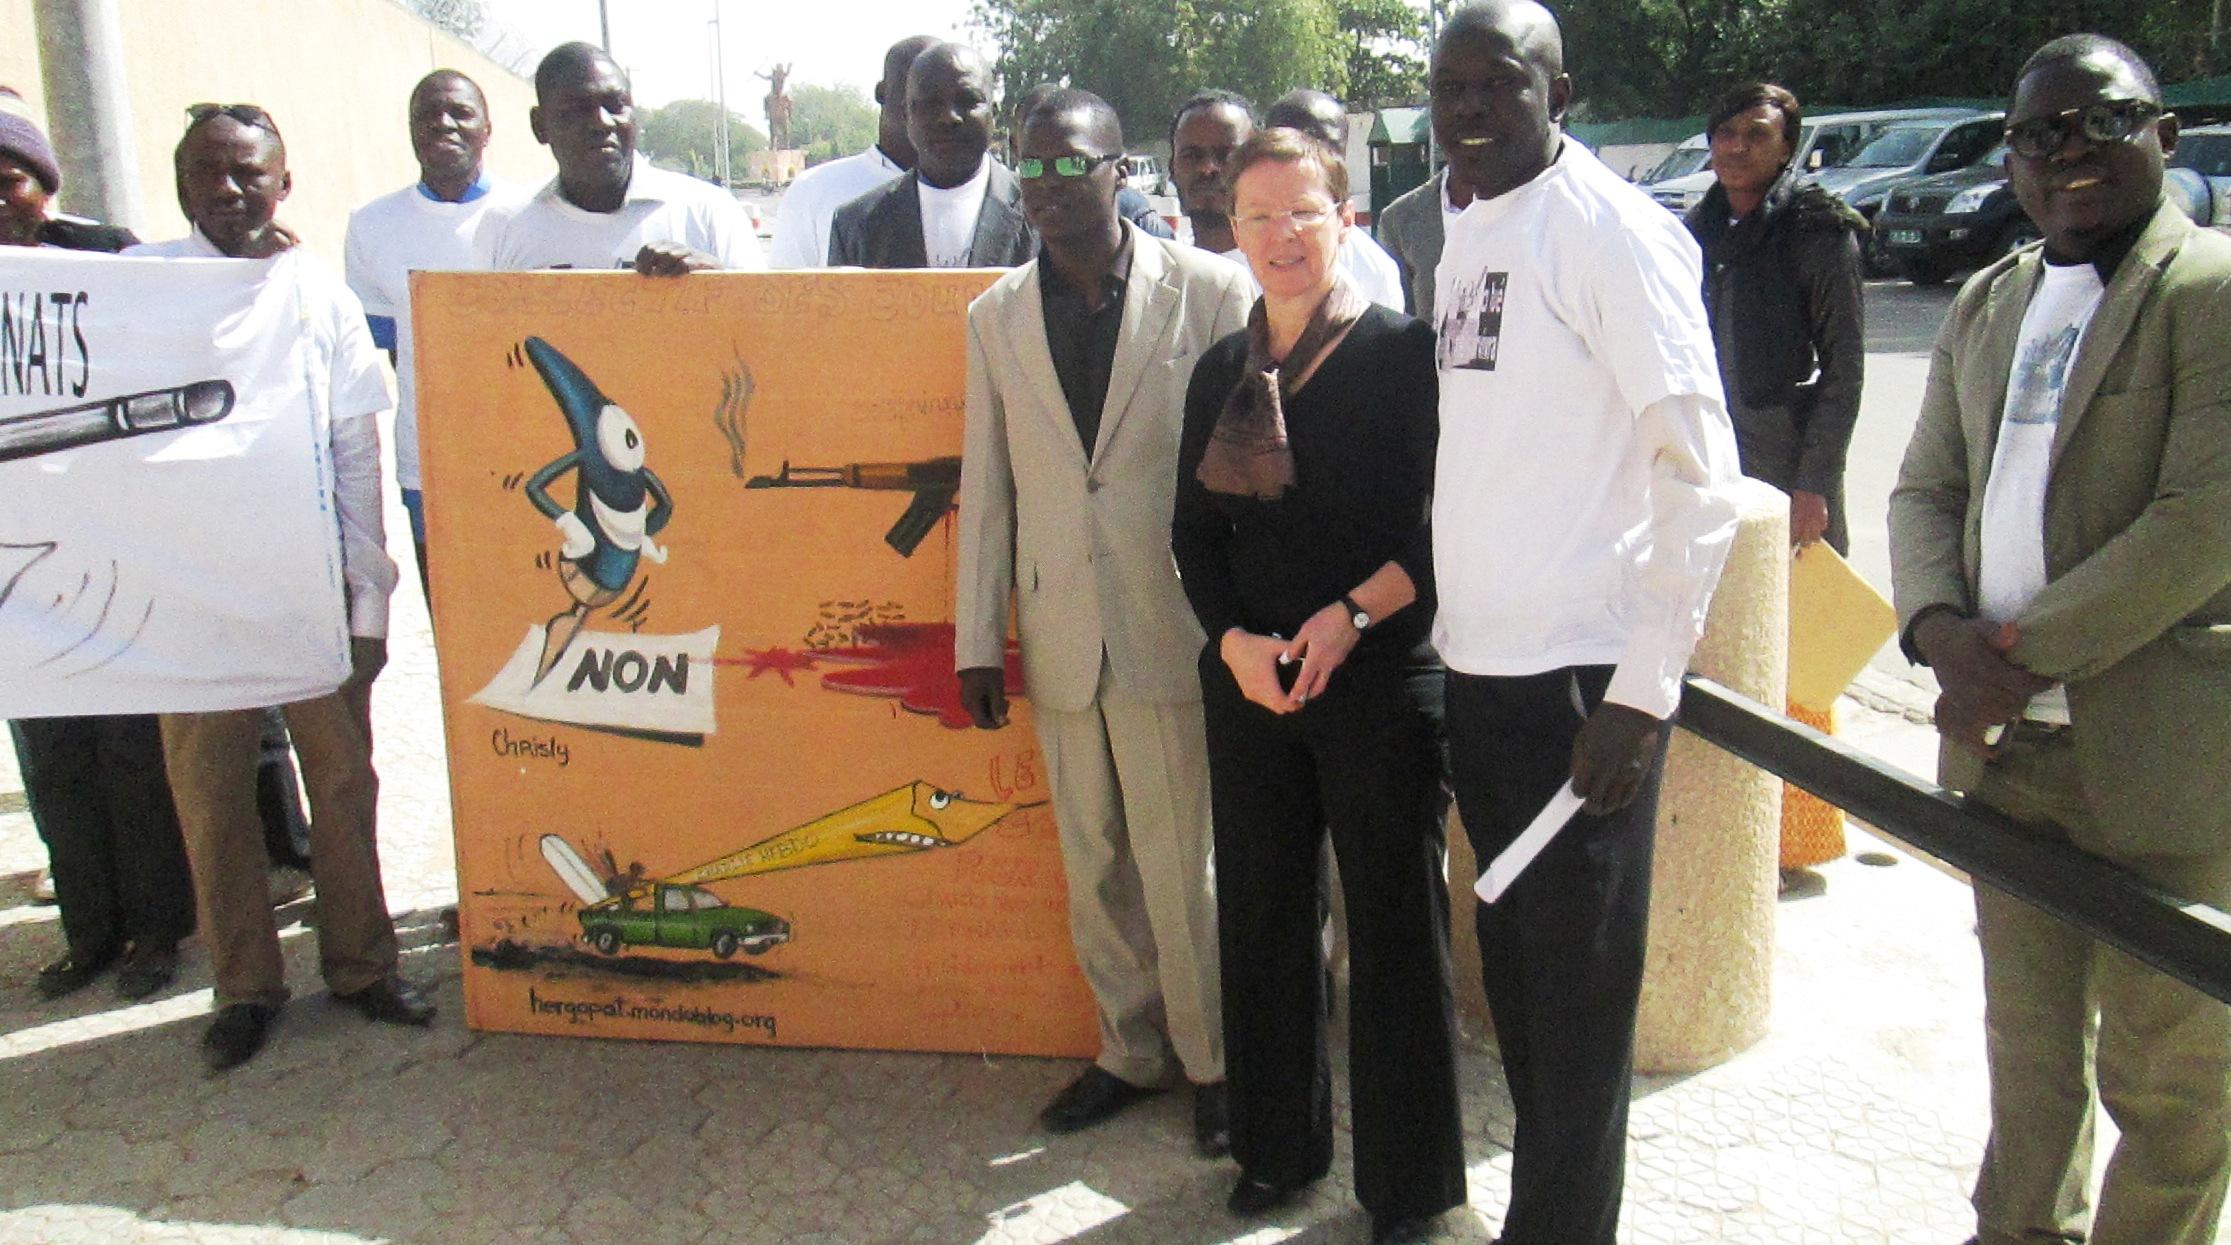 Les responsables des organes de presse devant l'Ambassade de France au Tchad